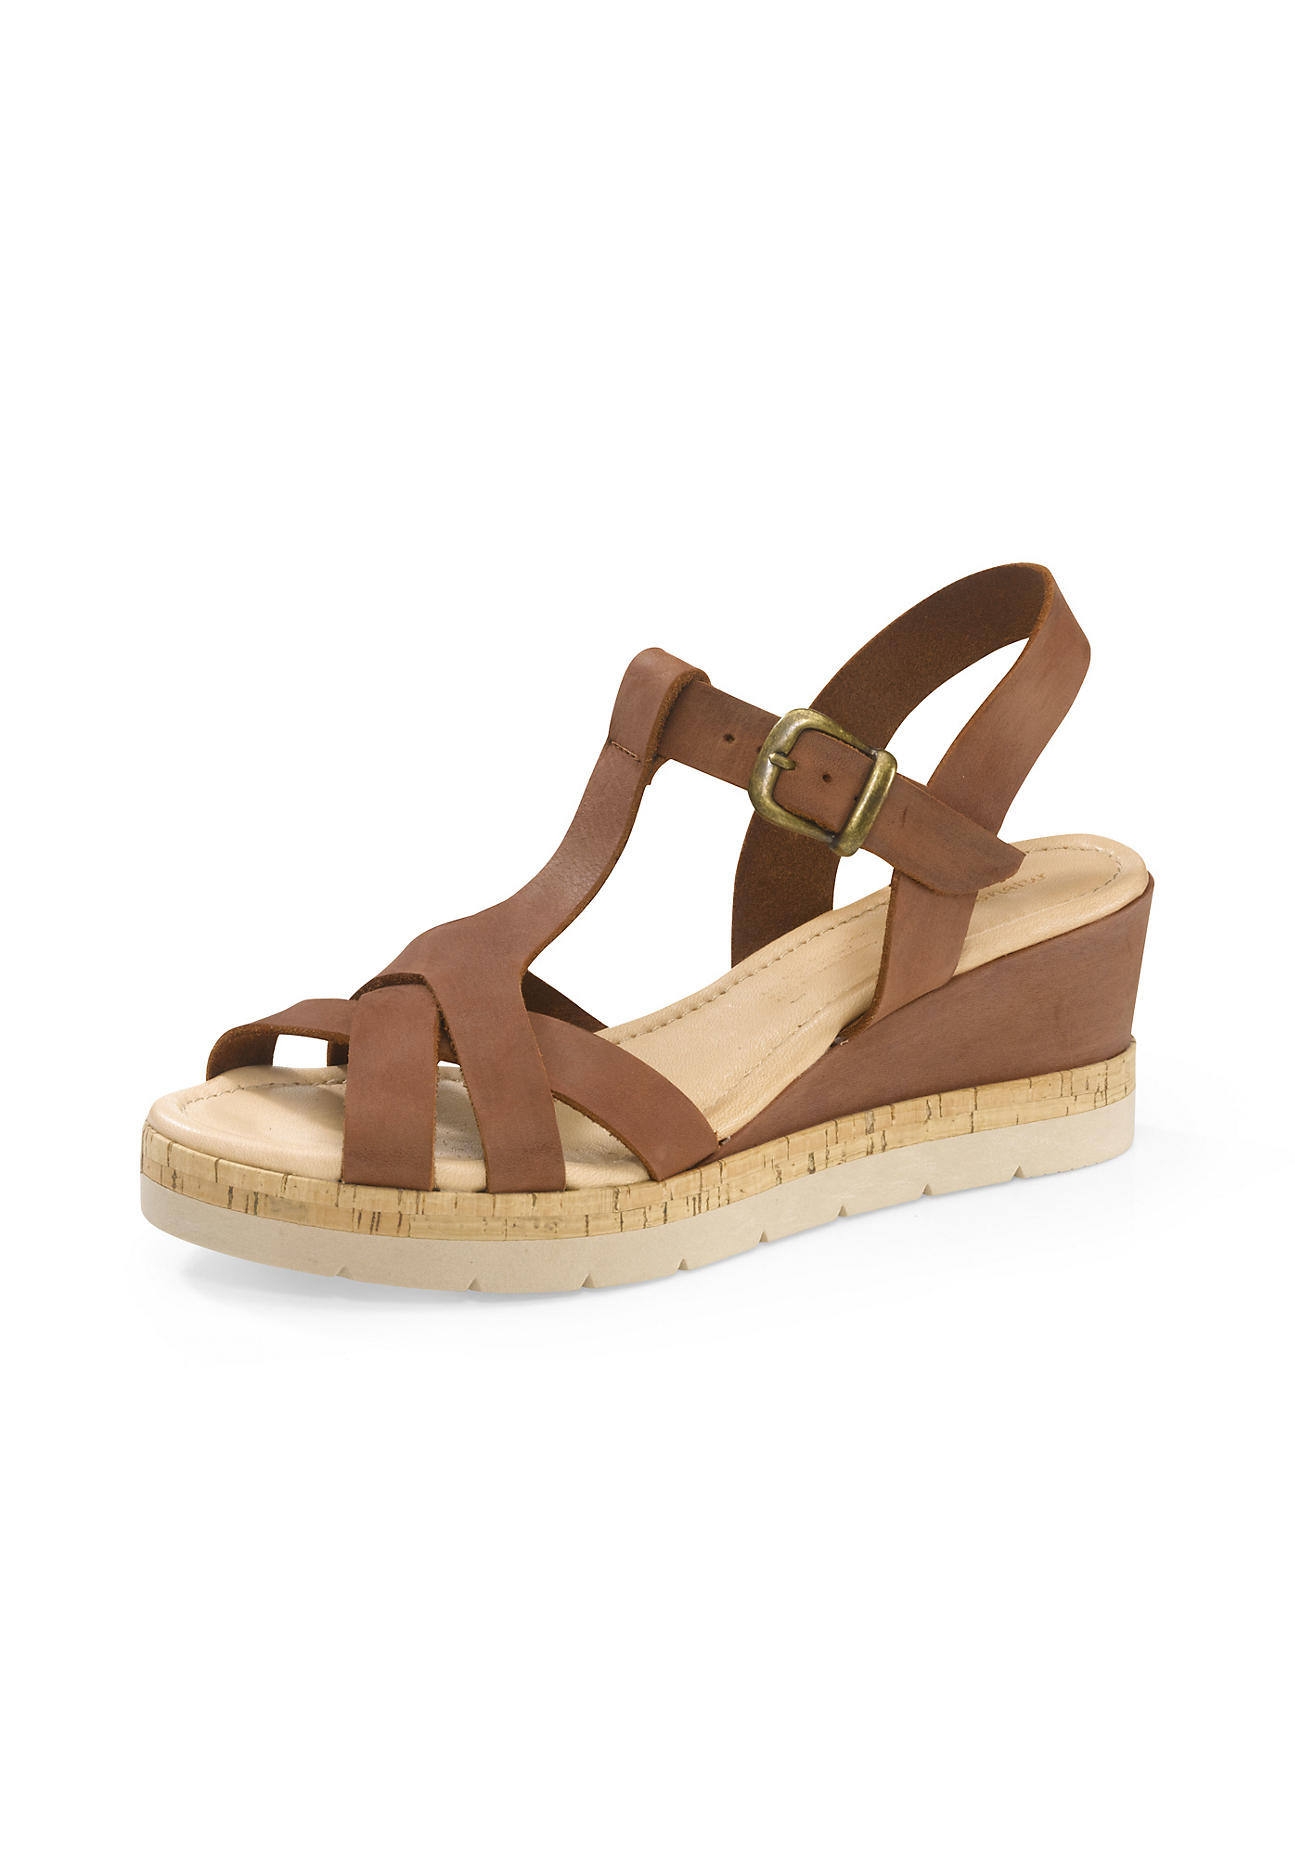 hessnatur Damen Damen Plateau-Sandalette aus Leder – braun – Größe 41